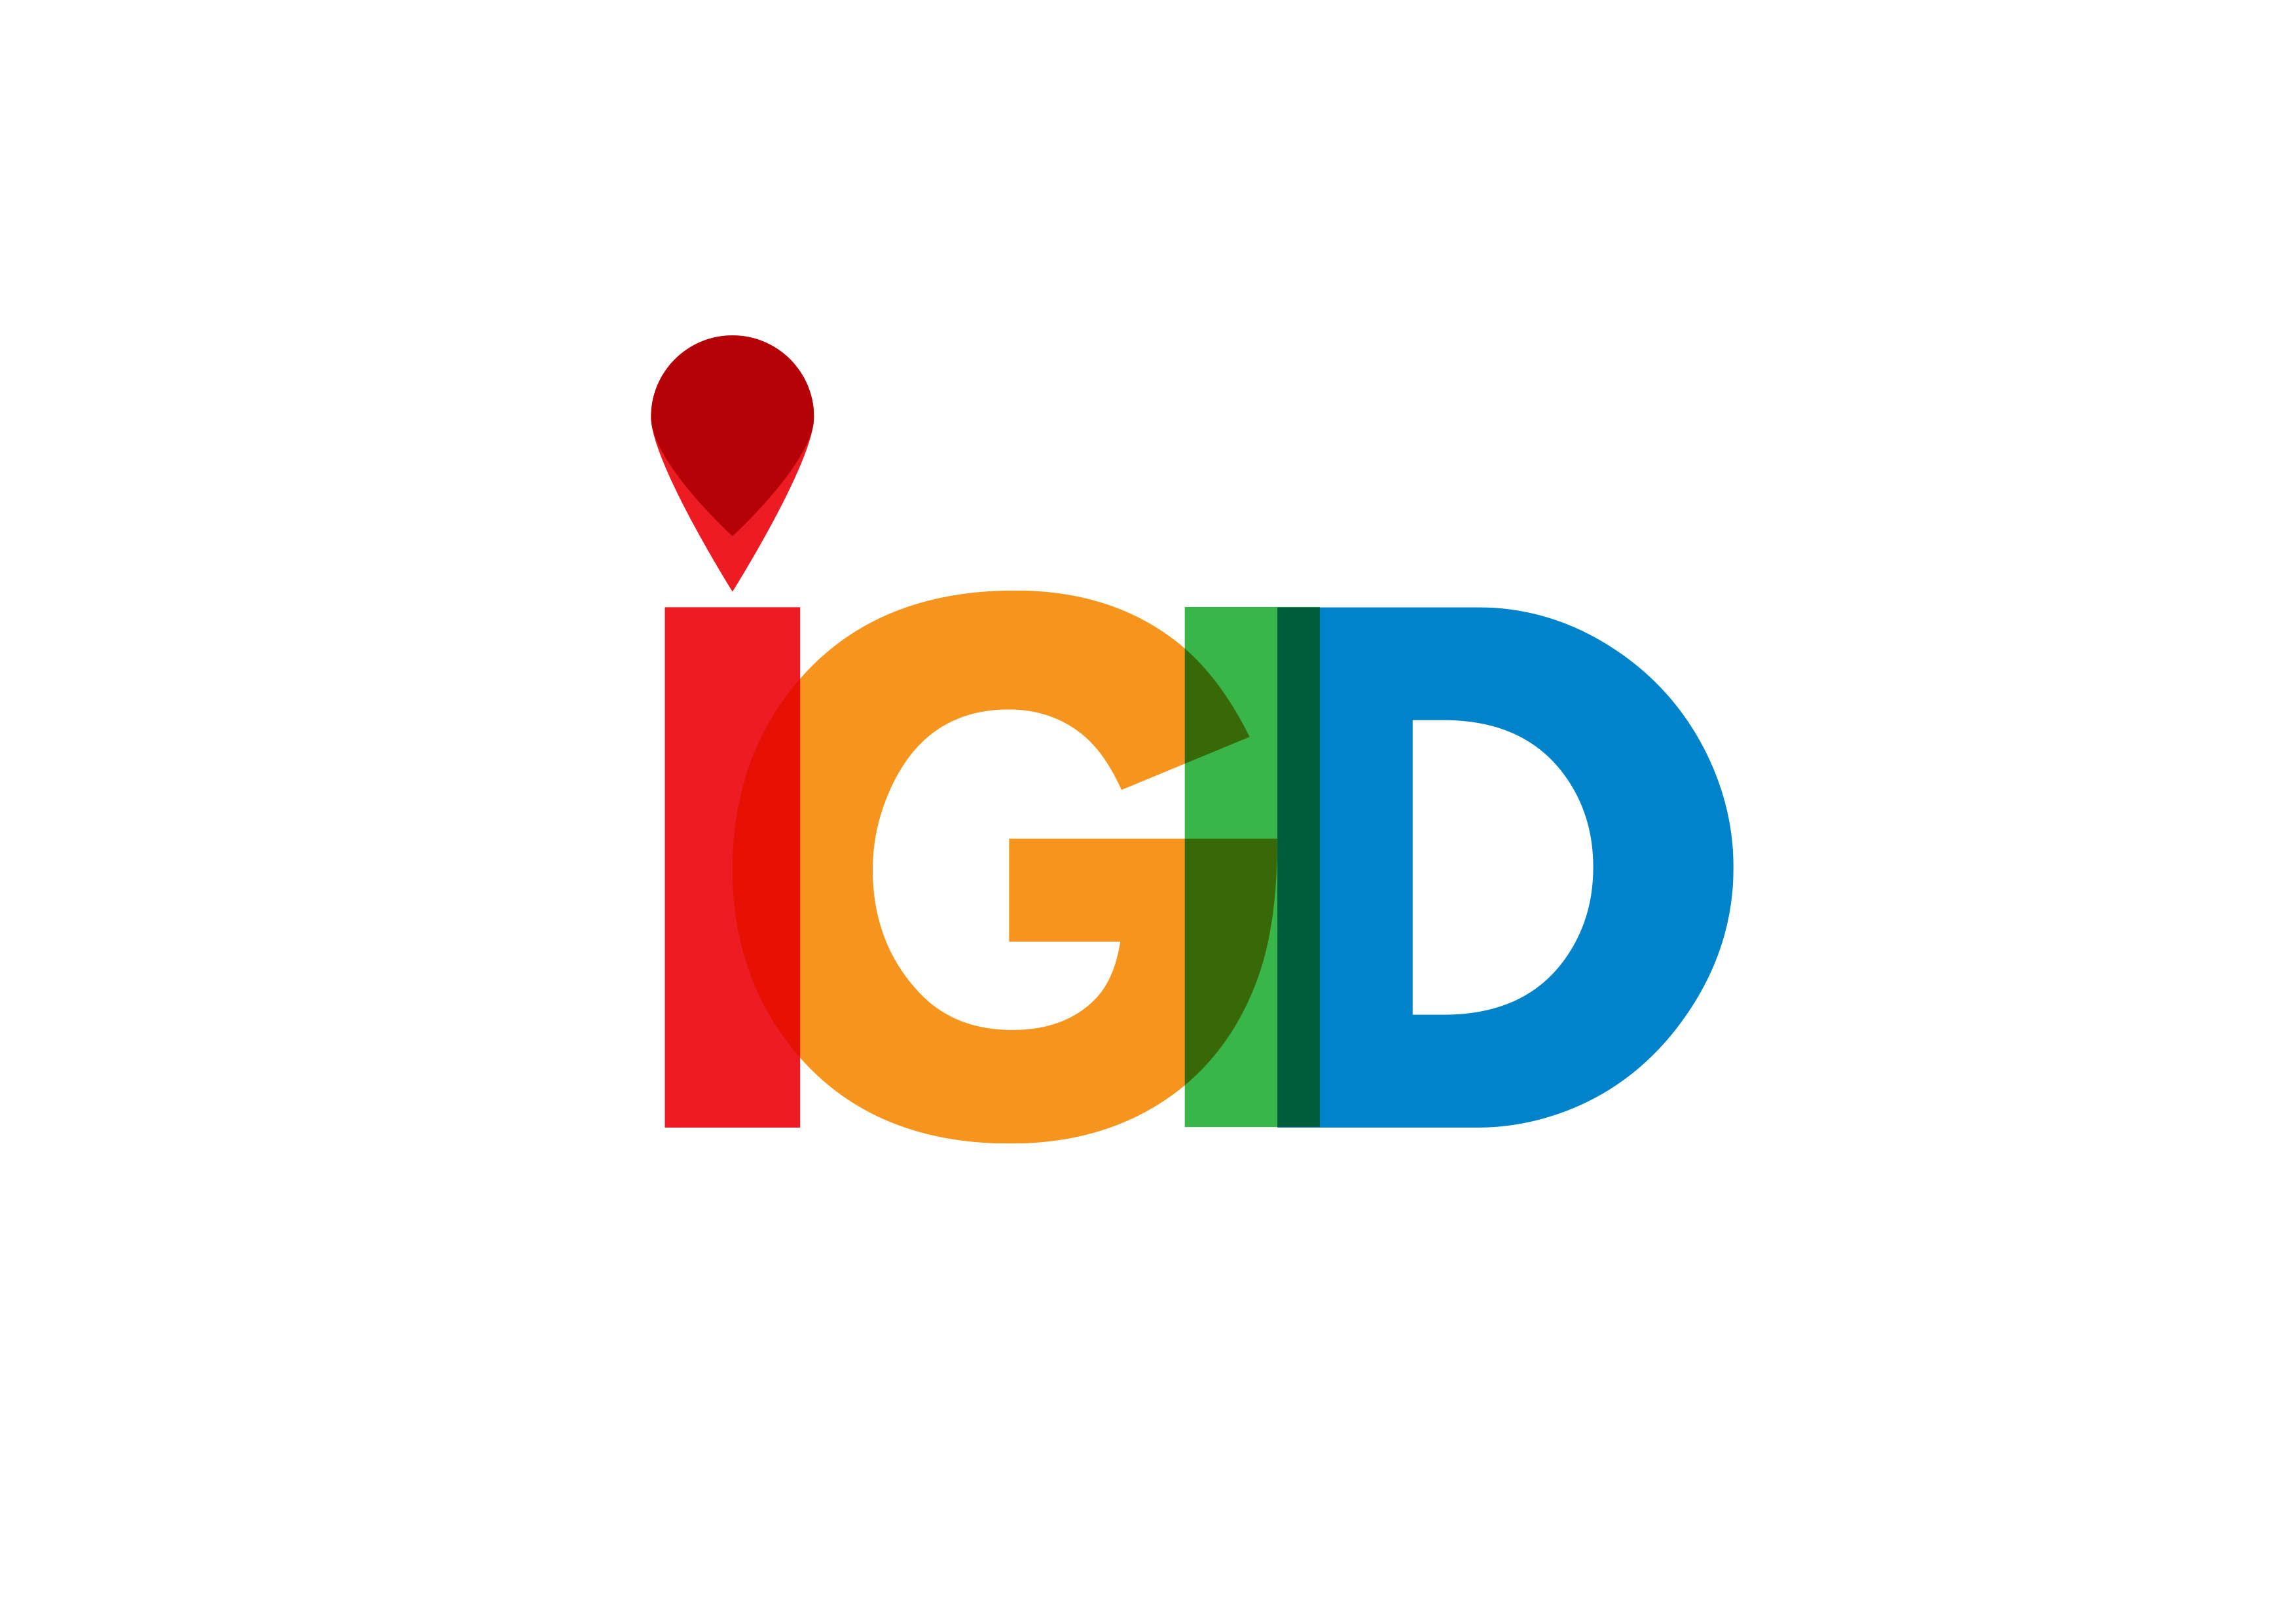 Создание логотипа iGid - дизайнер Jedi_artist